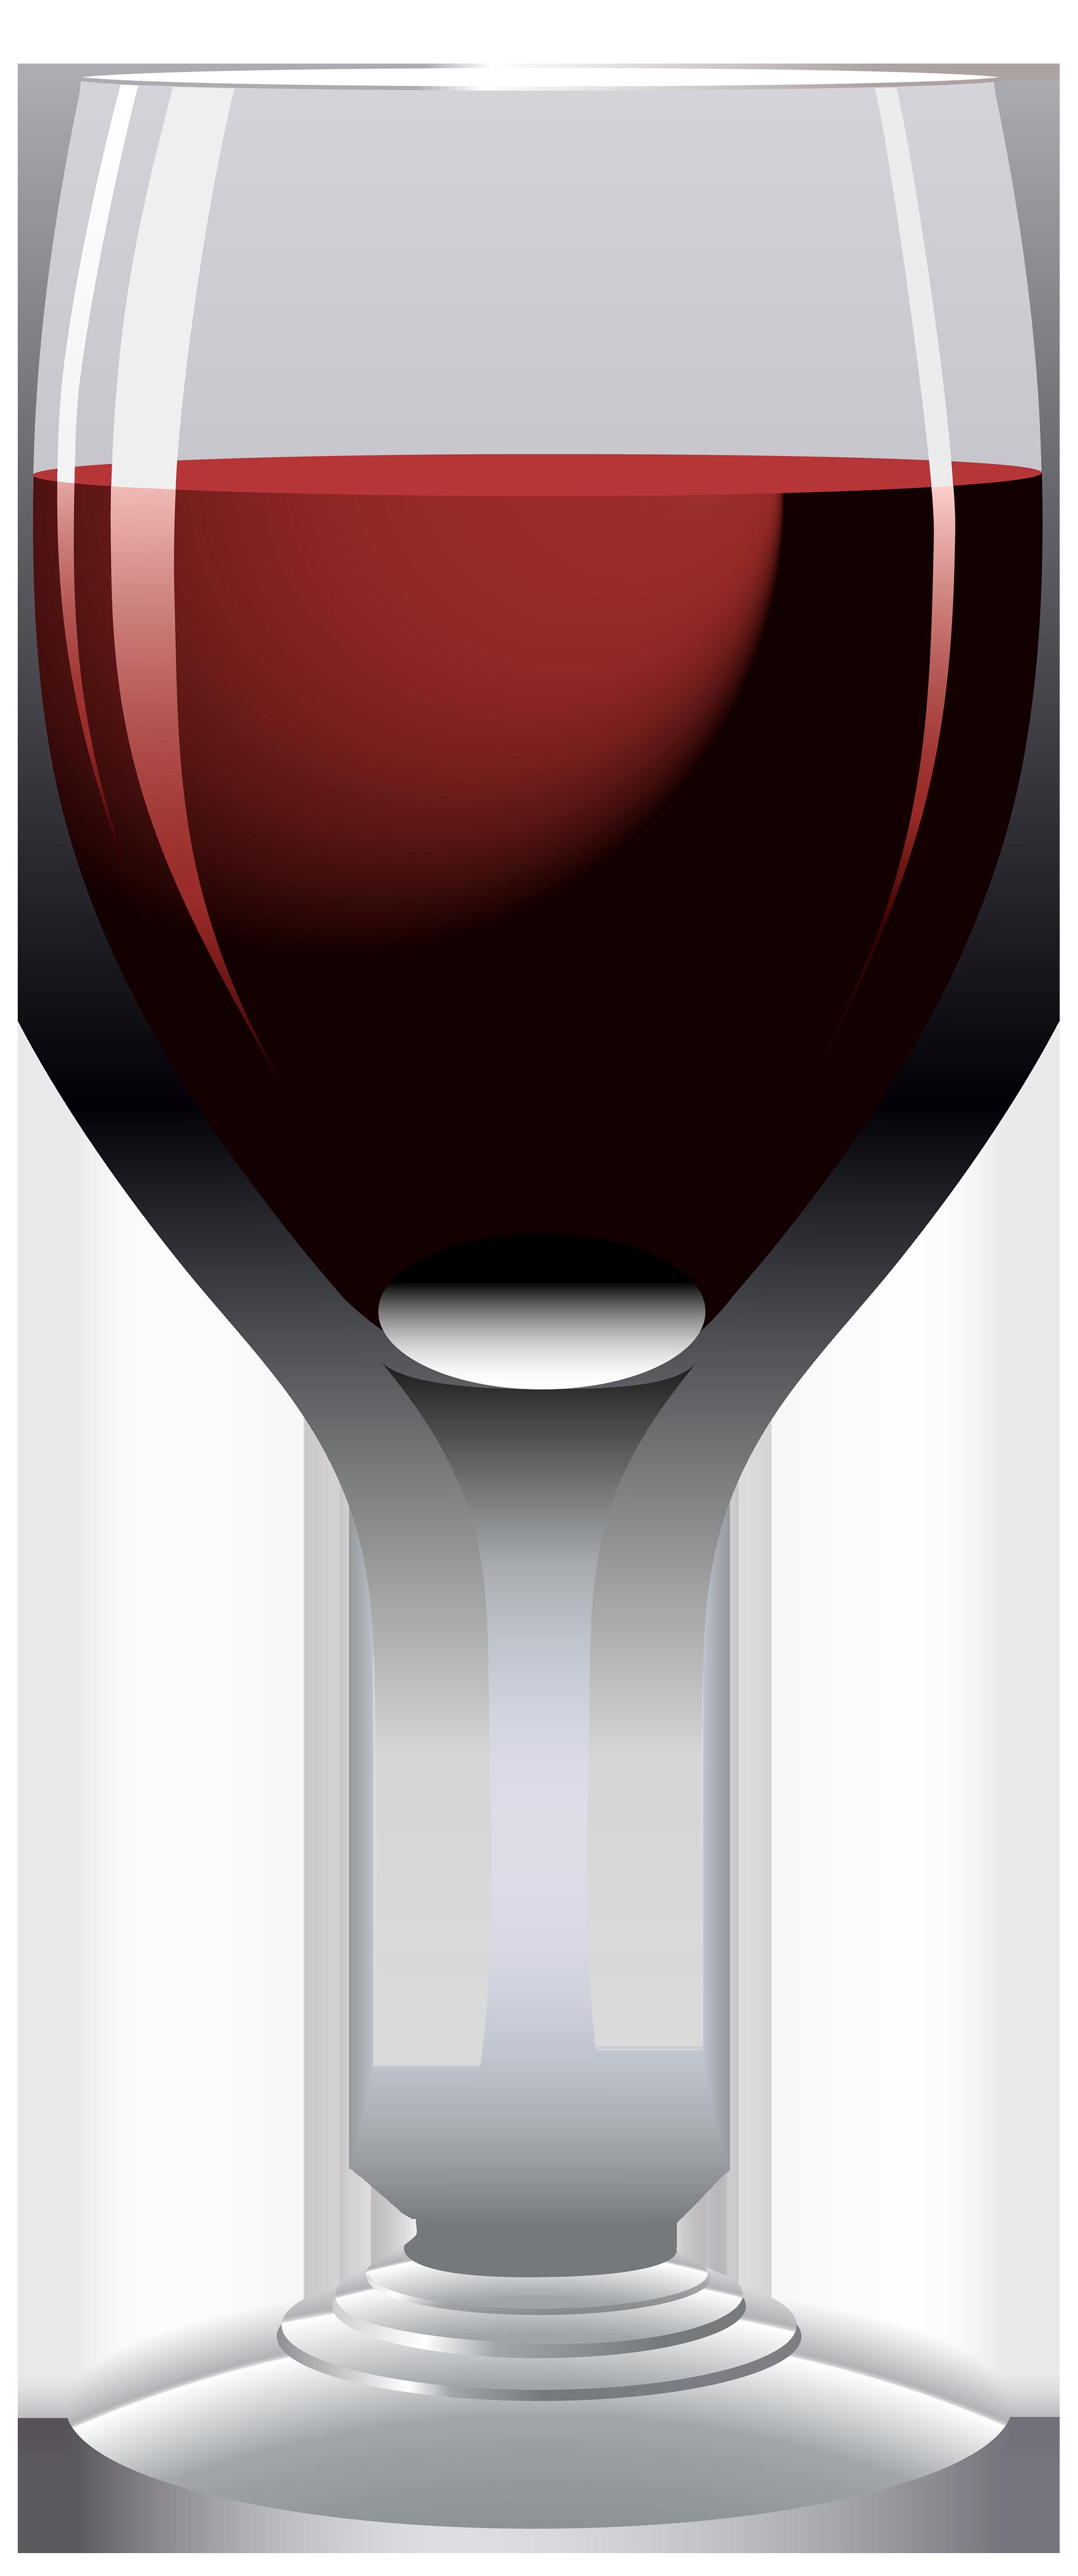 Goblet clipart wine glass #7